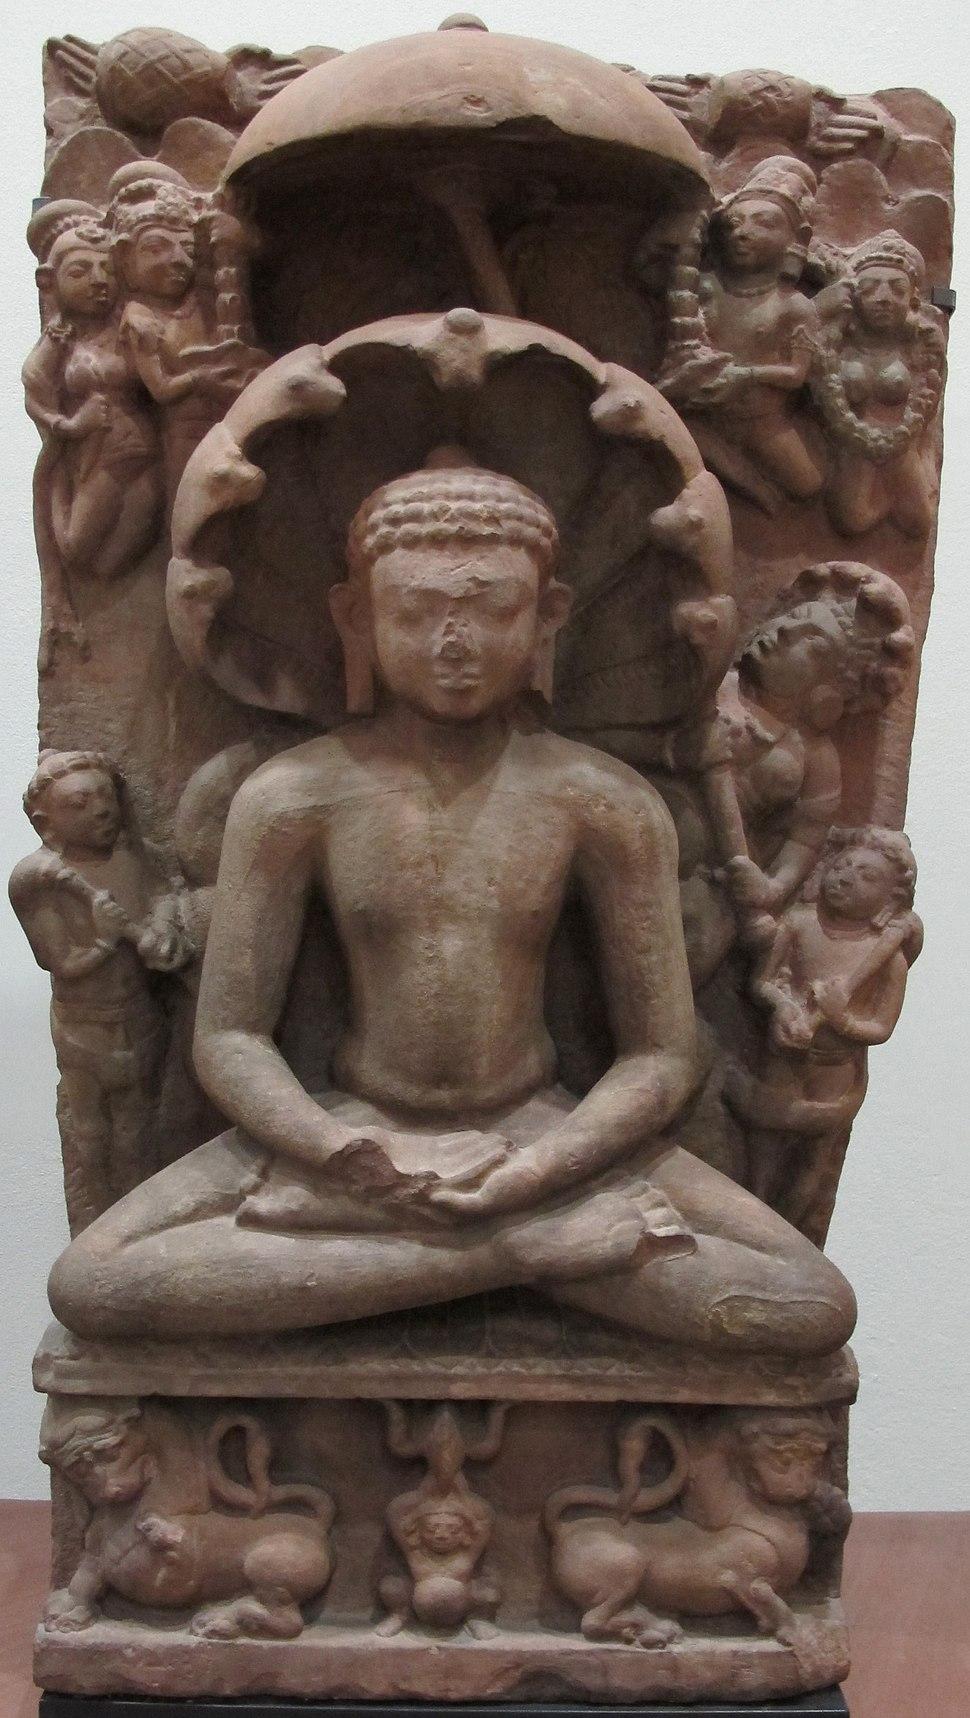 India, madhya pradesh, jina parshvanatha dalla temp%C3%A8esta, 600-700